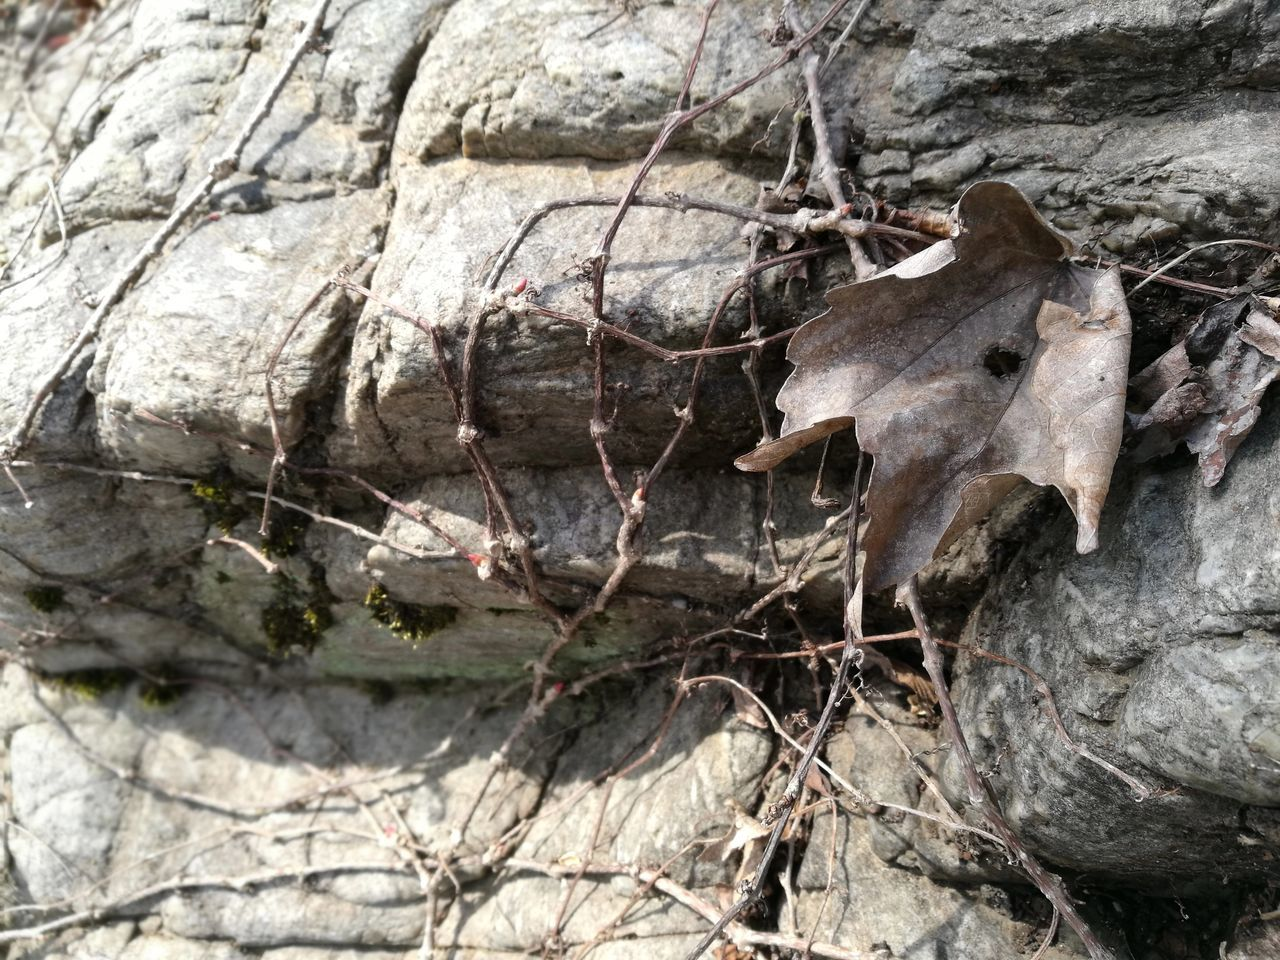 Close-up Nature No People Tree Outdoors Full Frame Textured  Day Stone Wabi-sabi